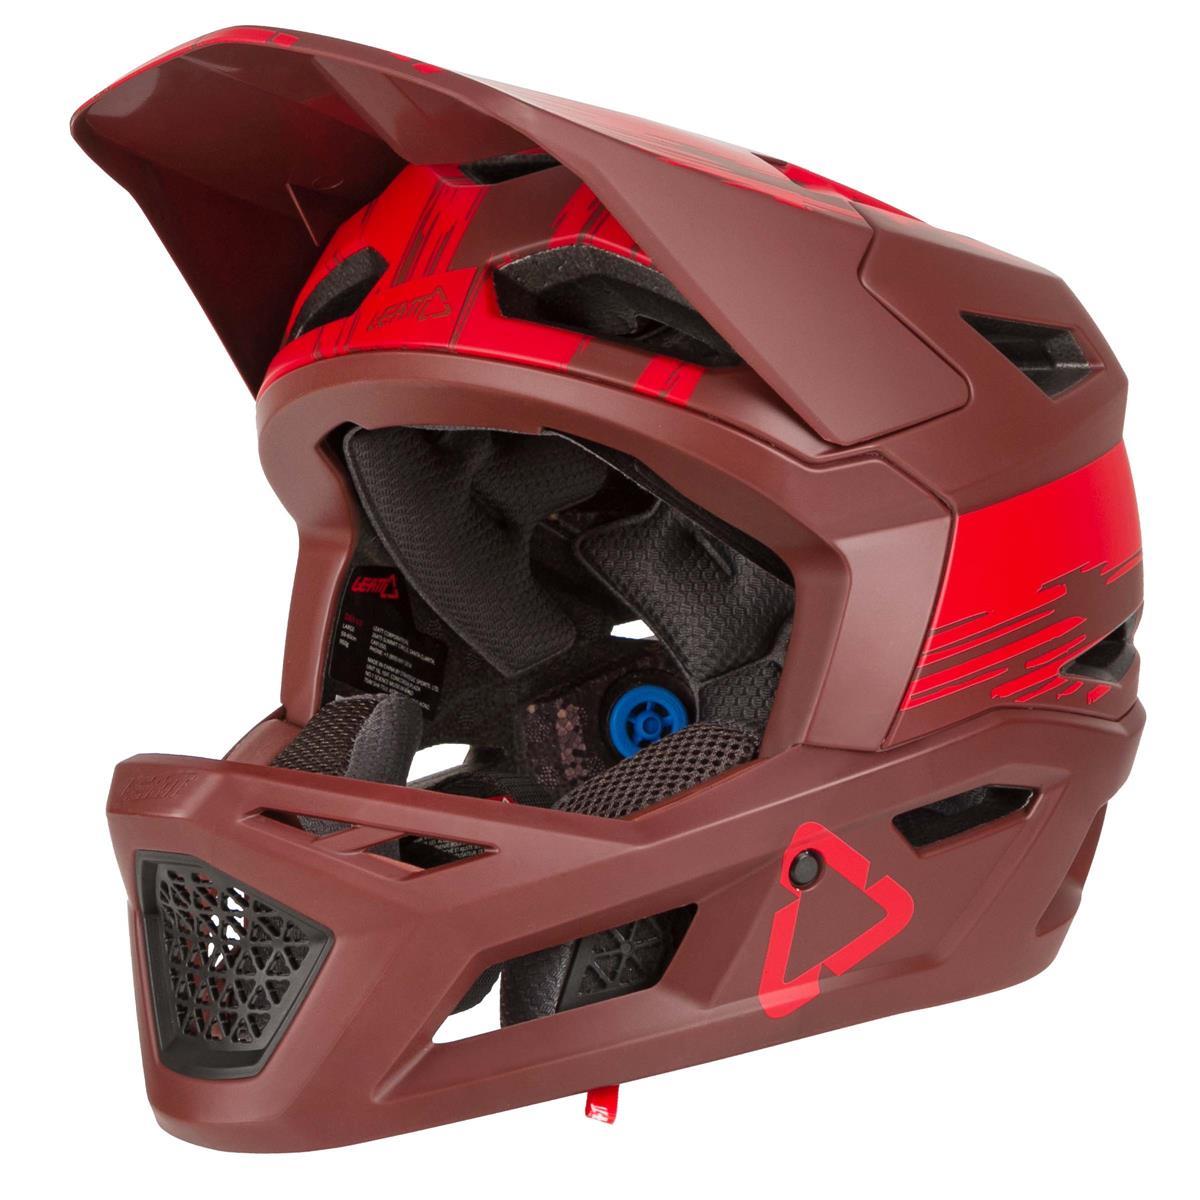 Leatt Downhill-MTB Helm DBX 4.0 Ruby